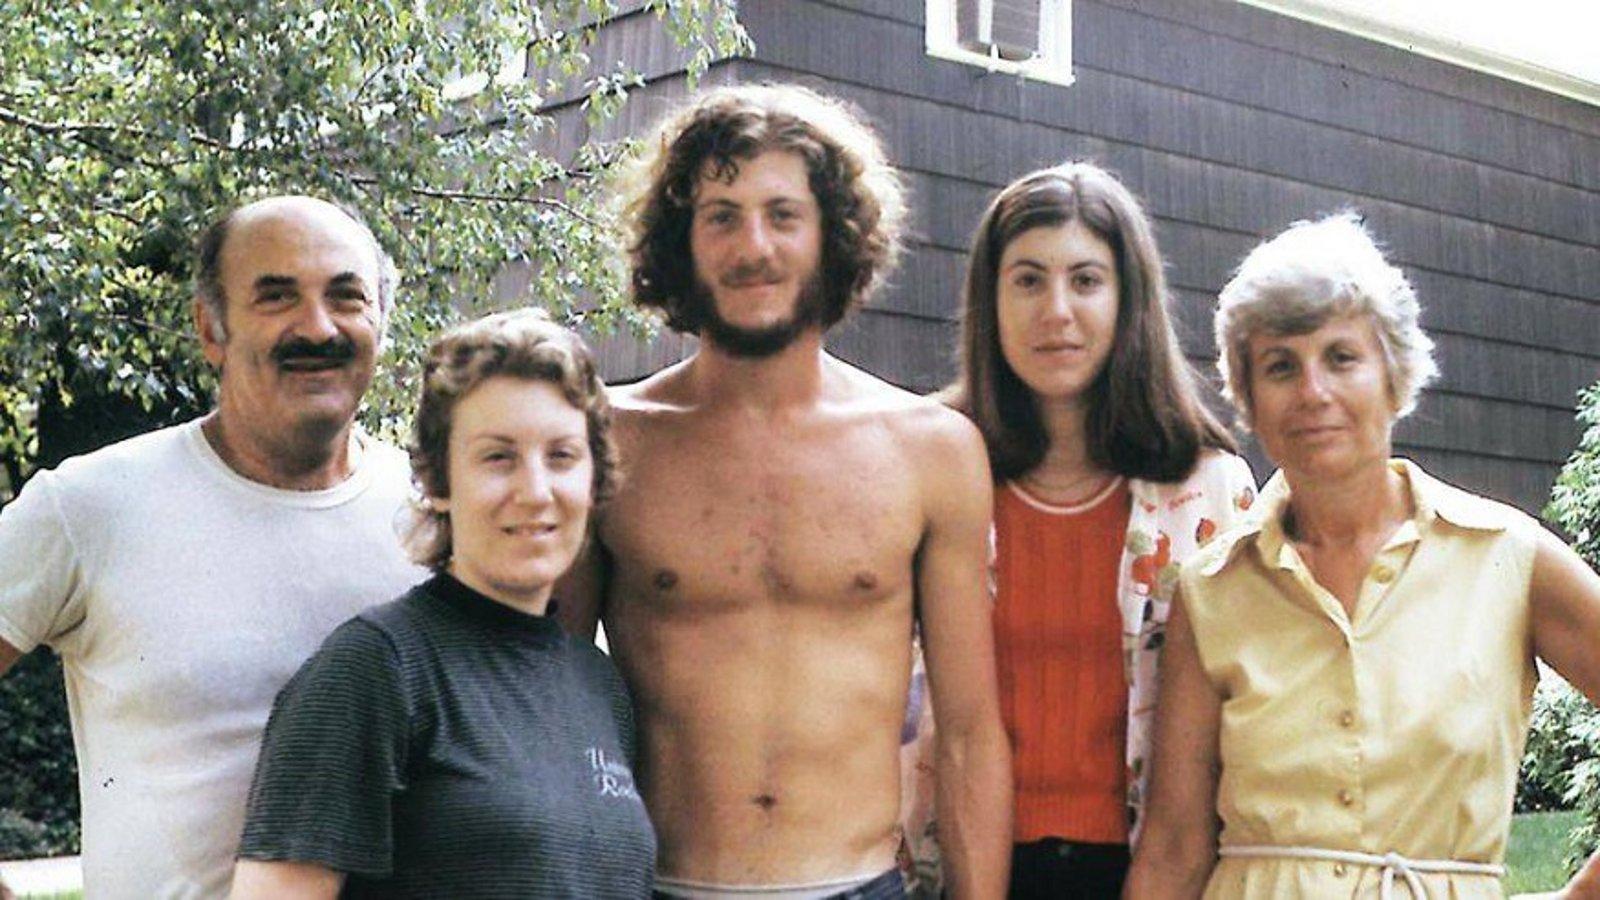 51 Birch Street - A Family Mystery